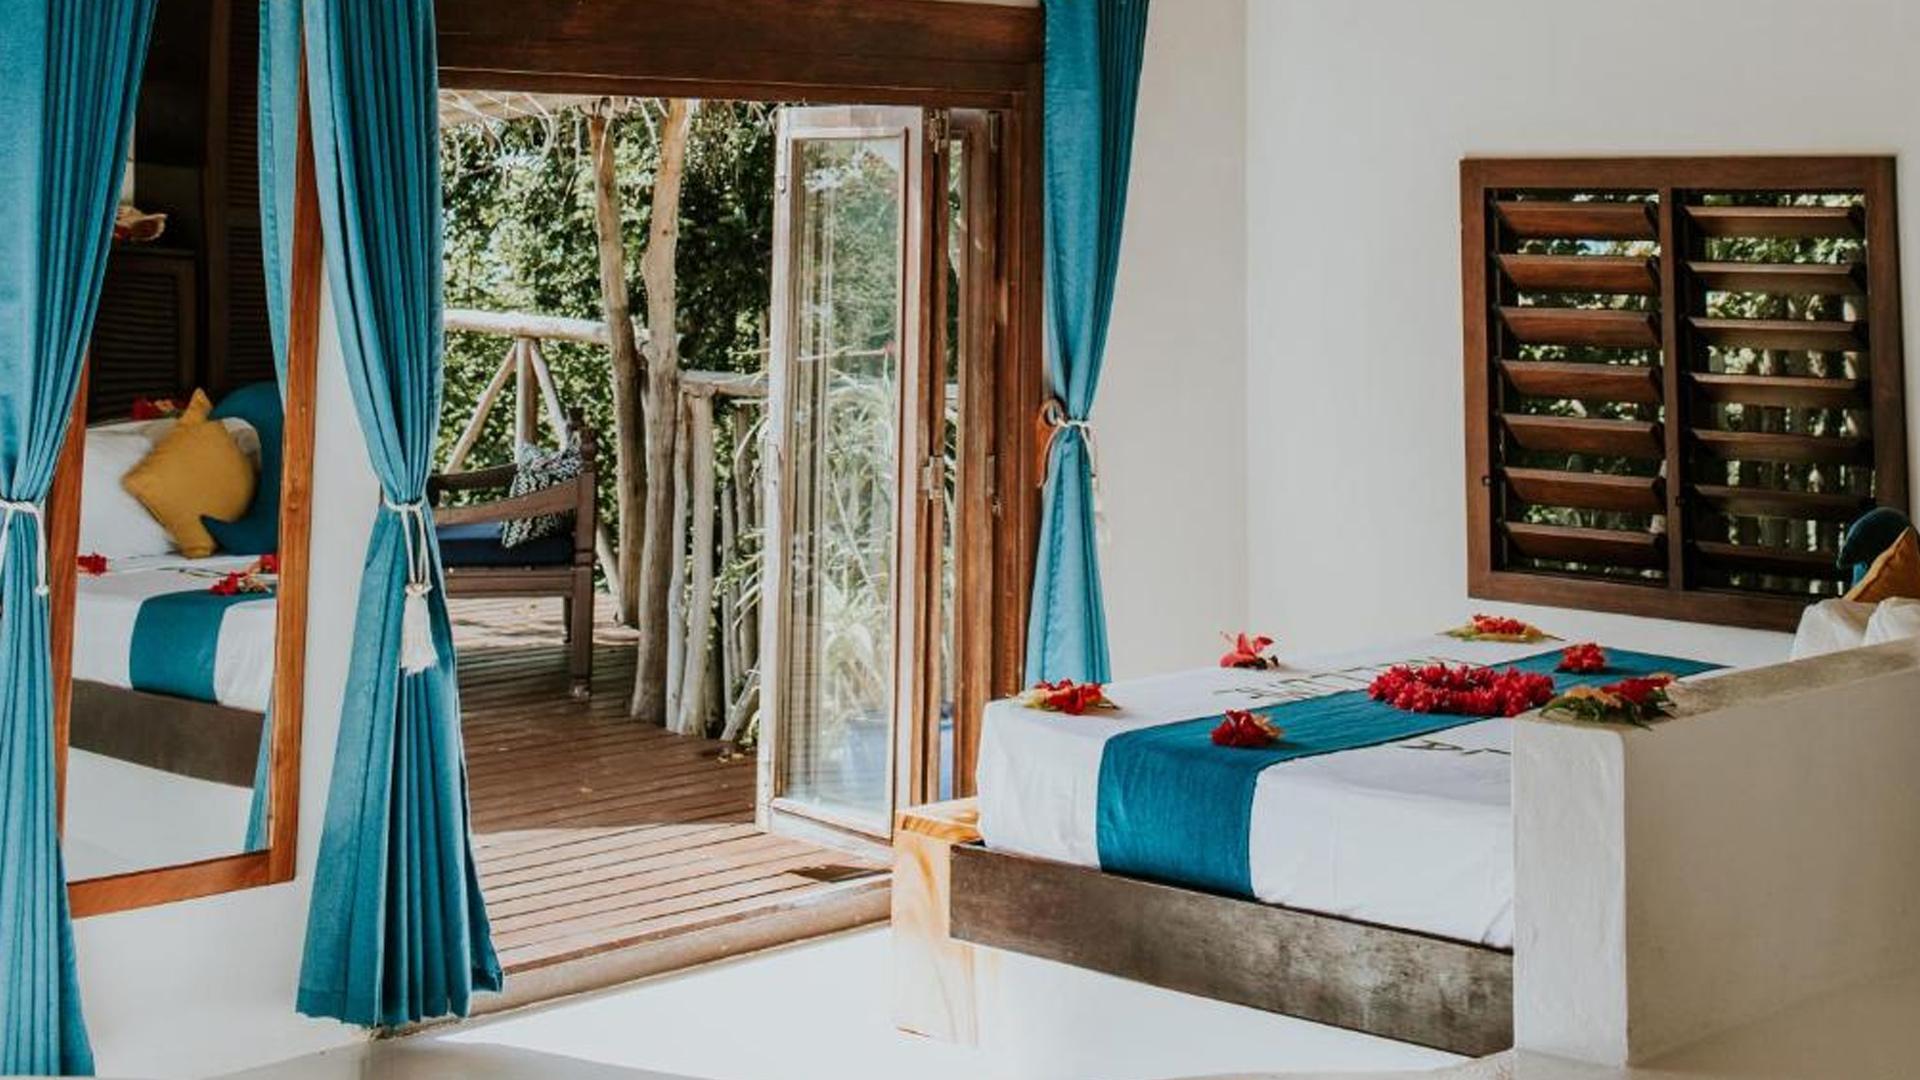 Two-Bedroom Beachfront Bure image 1 at Navutu Stars Resort by null, null, Fiji